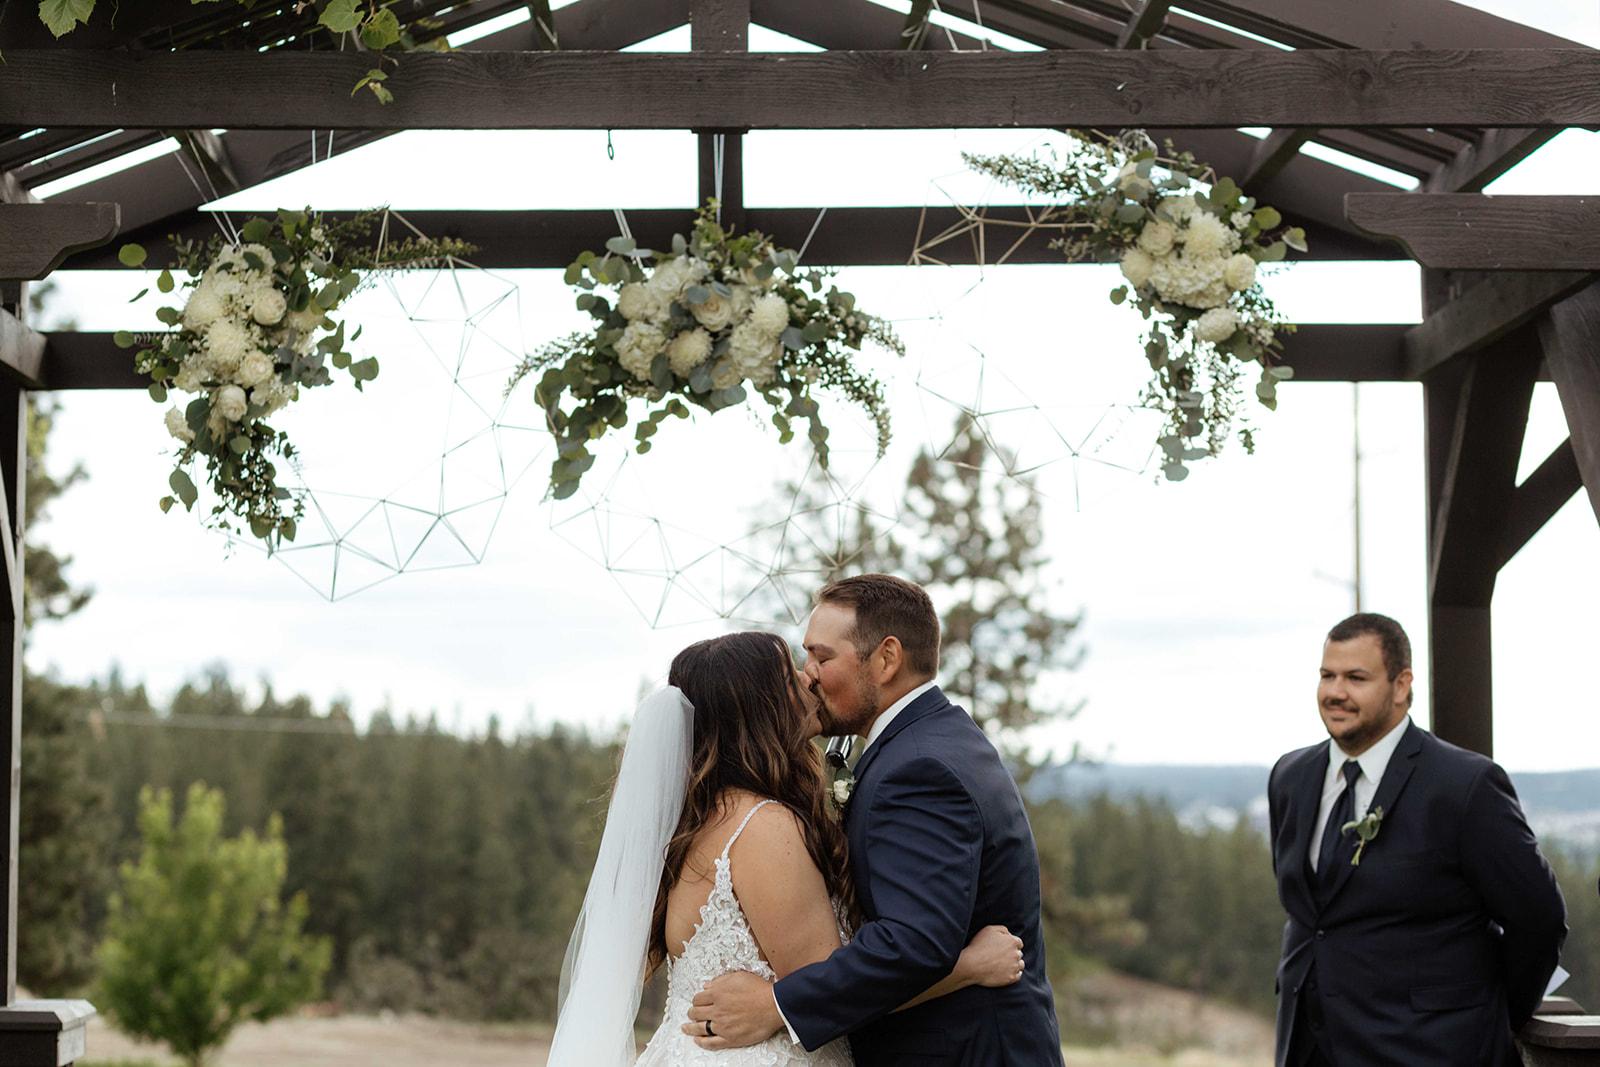 beacon hill wedding honest in ivory dress spokane kiss